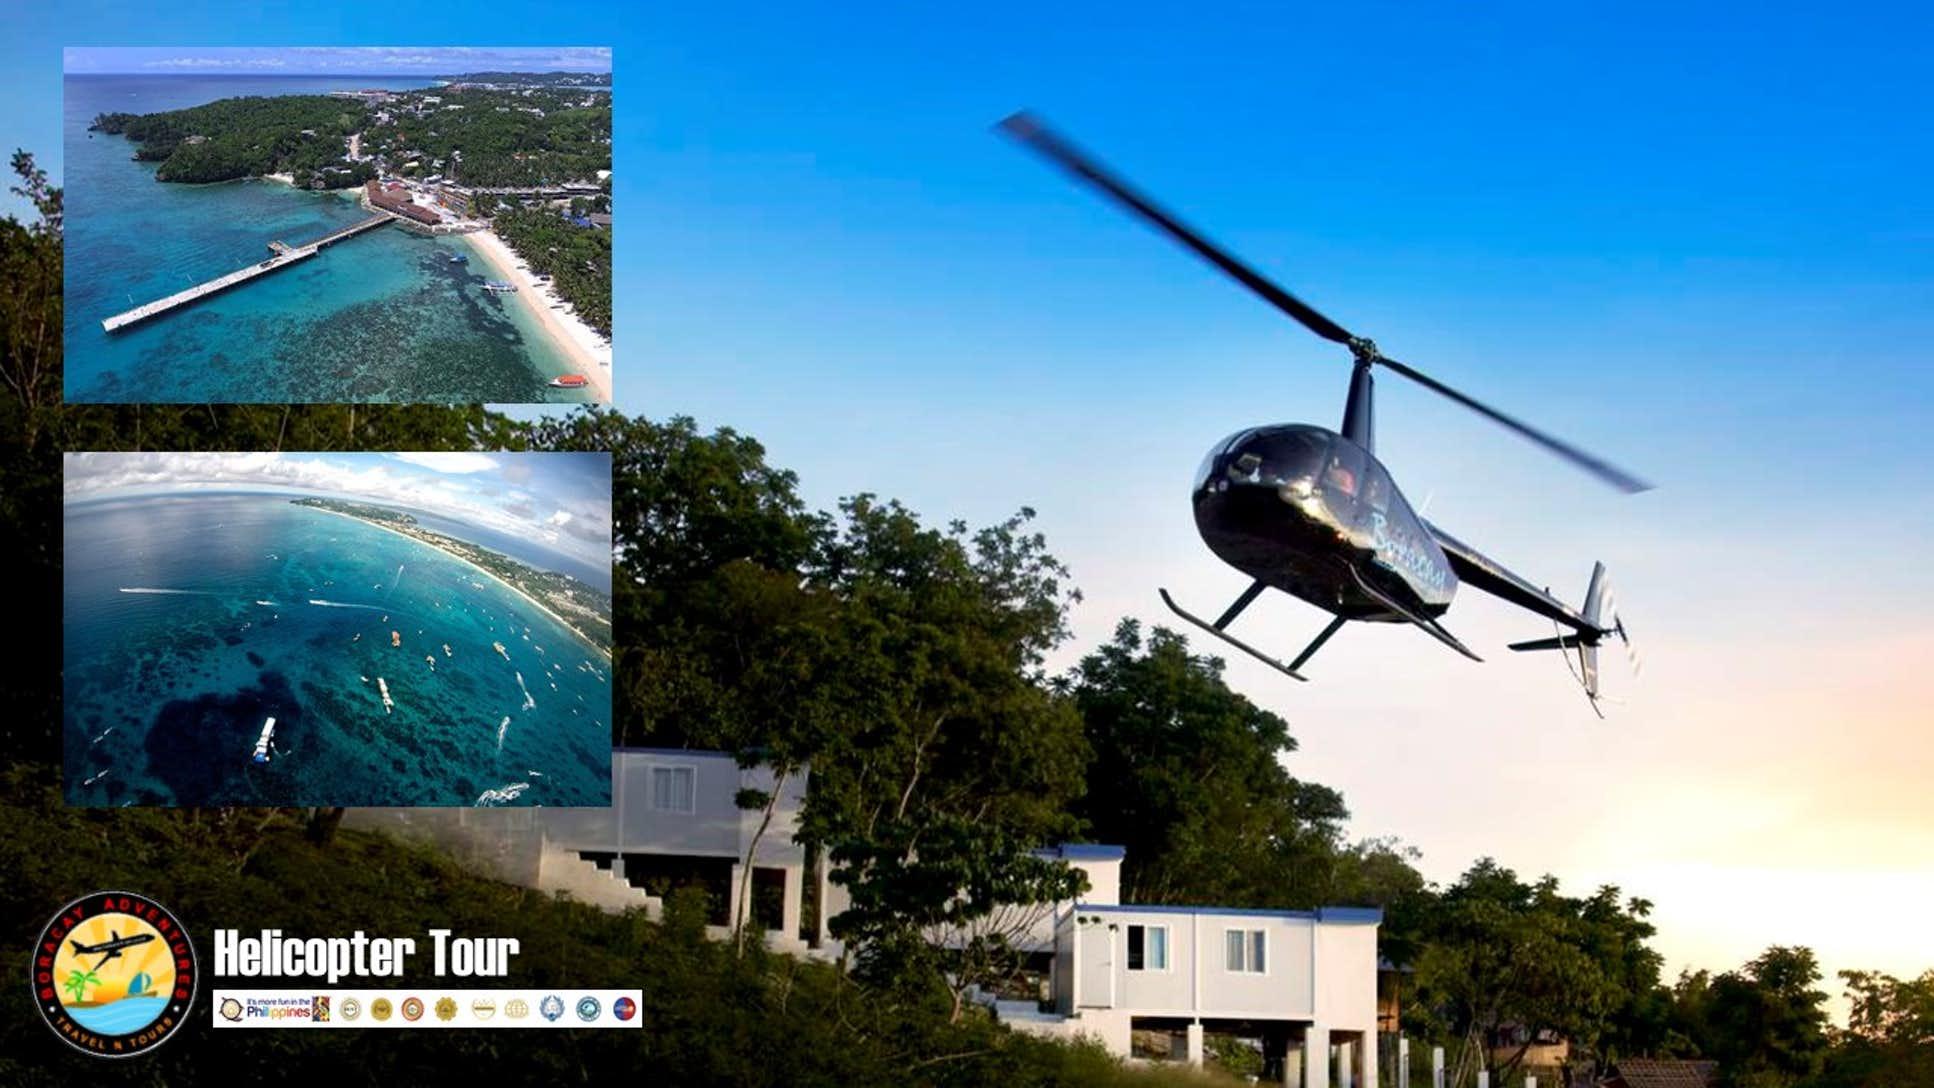 Helicopter tour around Boracay Island